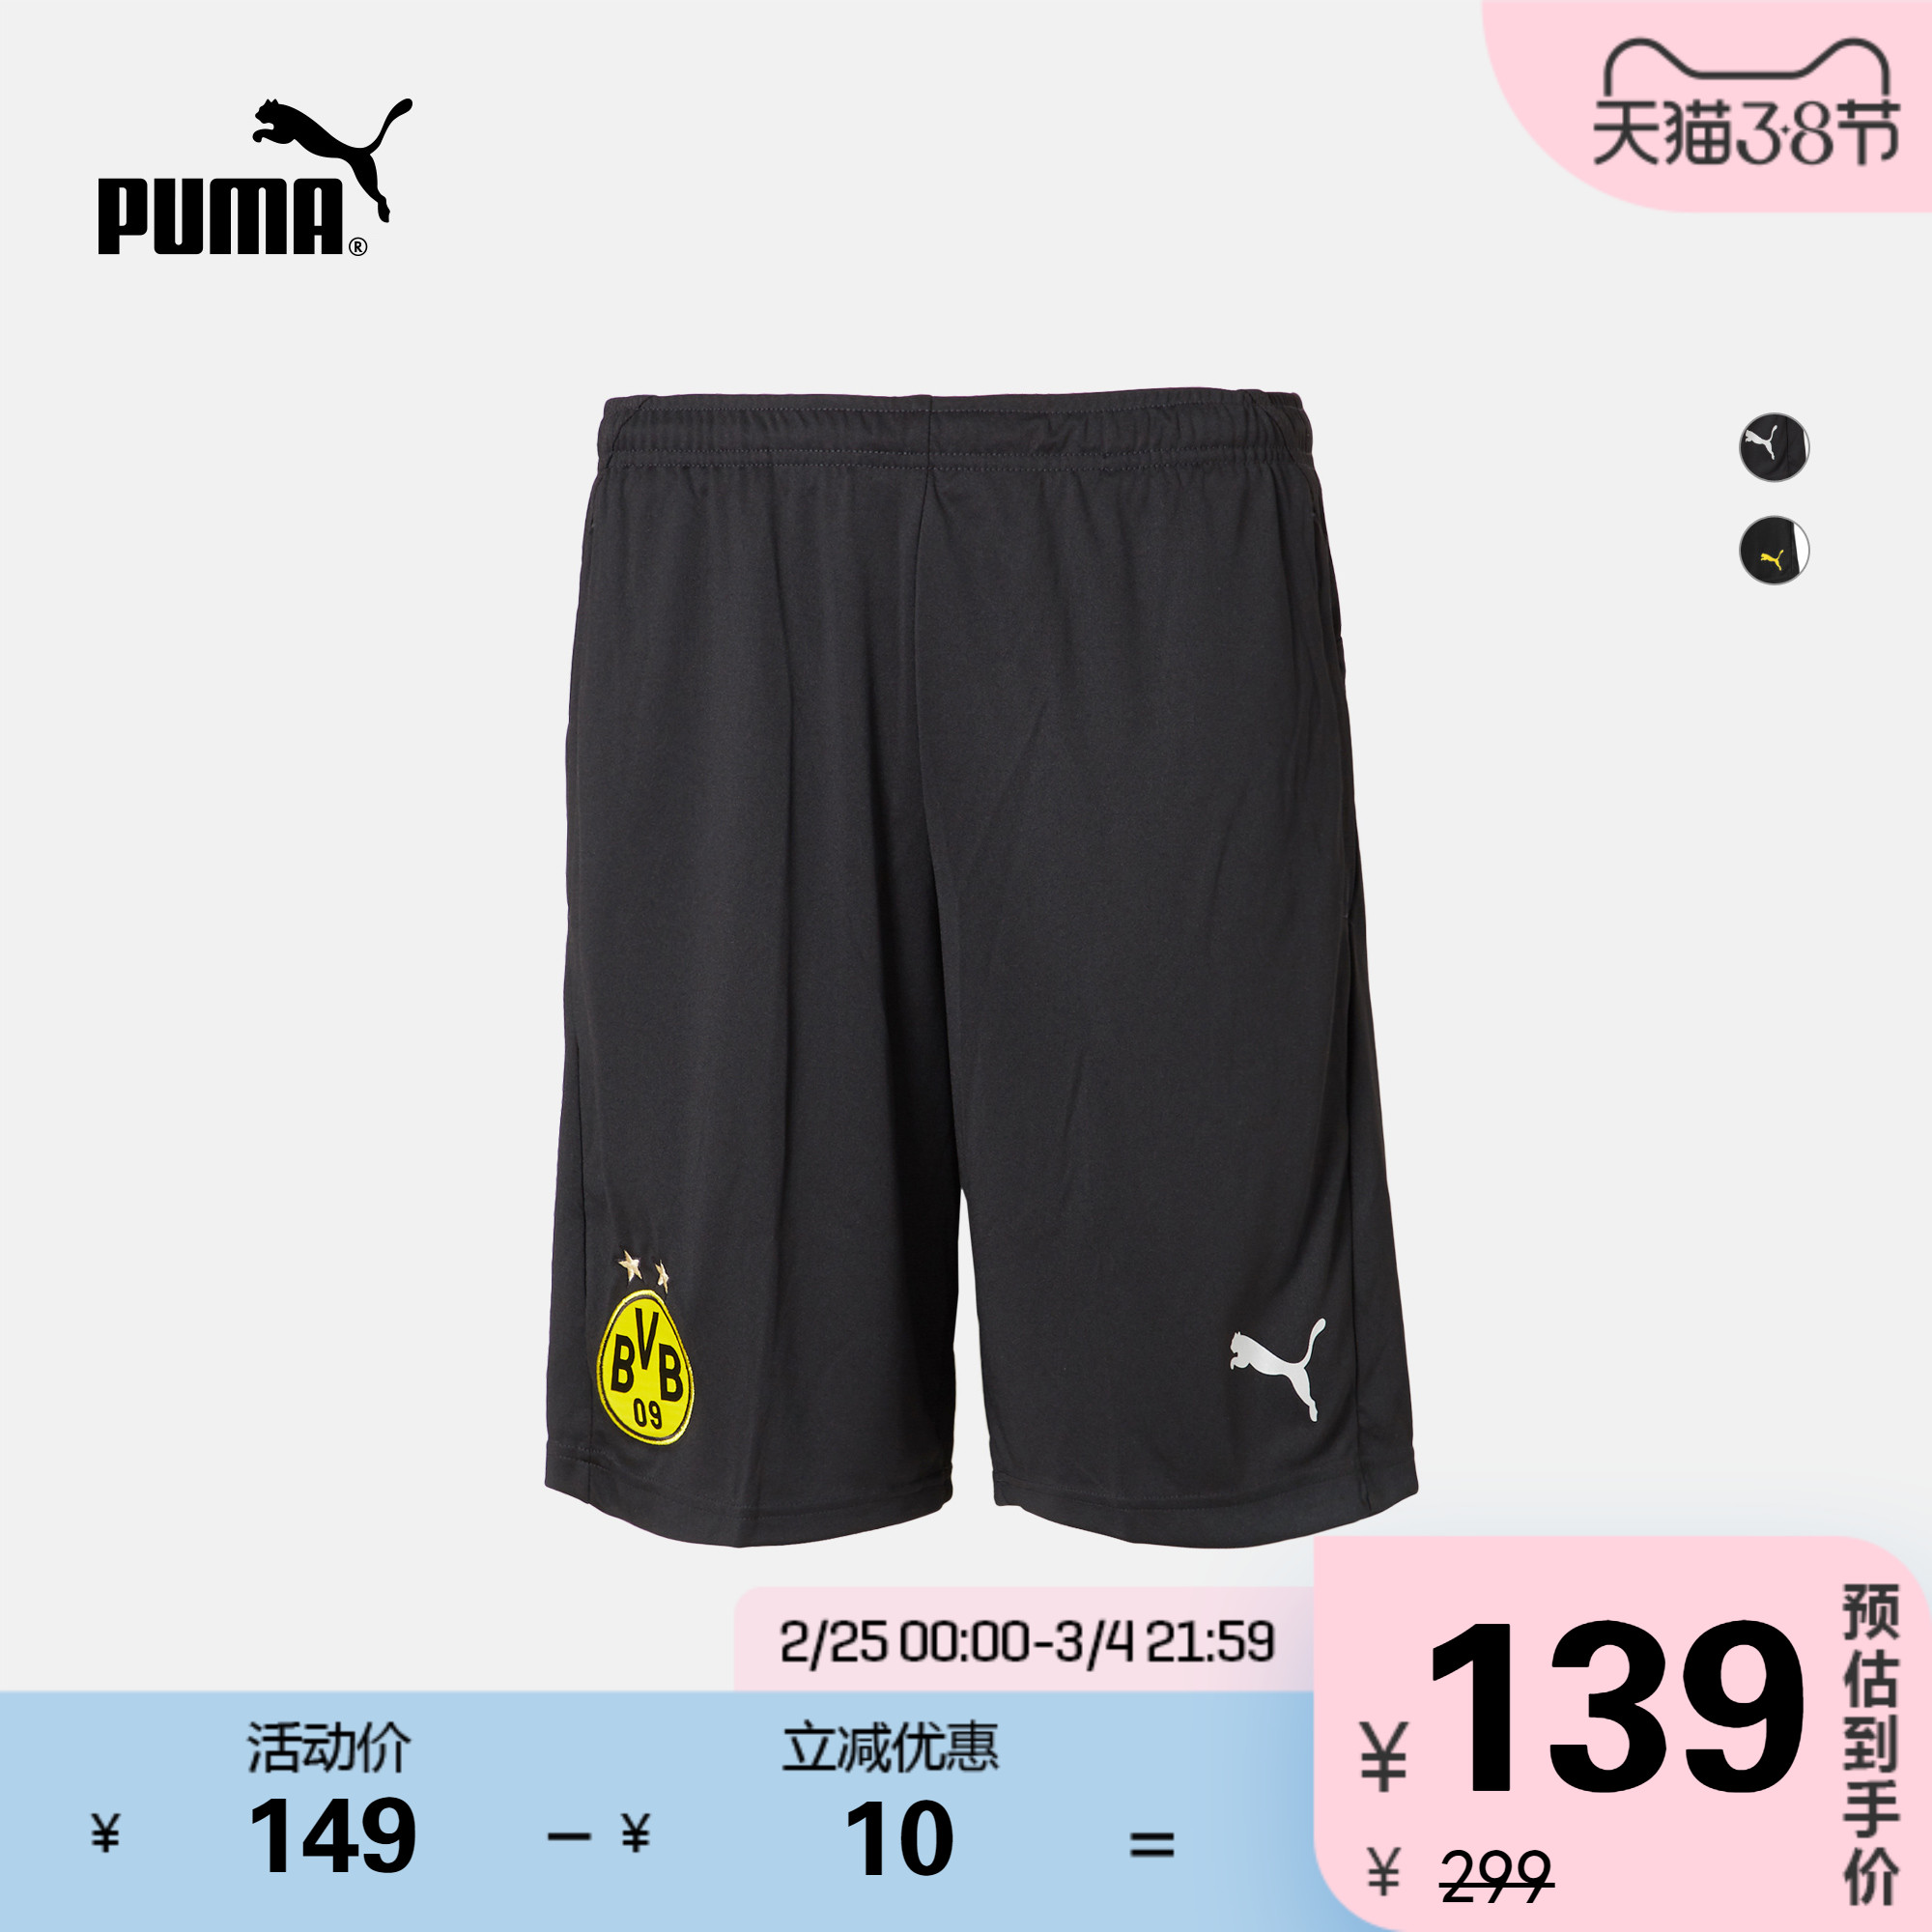 PUMA彪马官方正品 19/20赛季多特蒙德男子训练短裤 BVB 753497